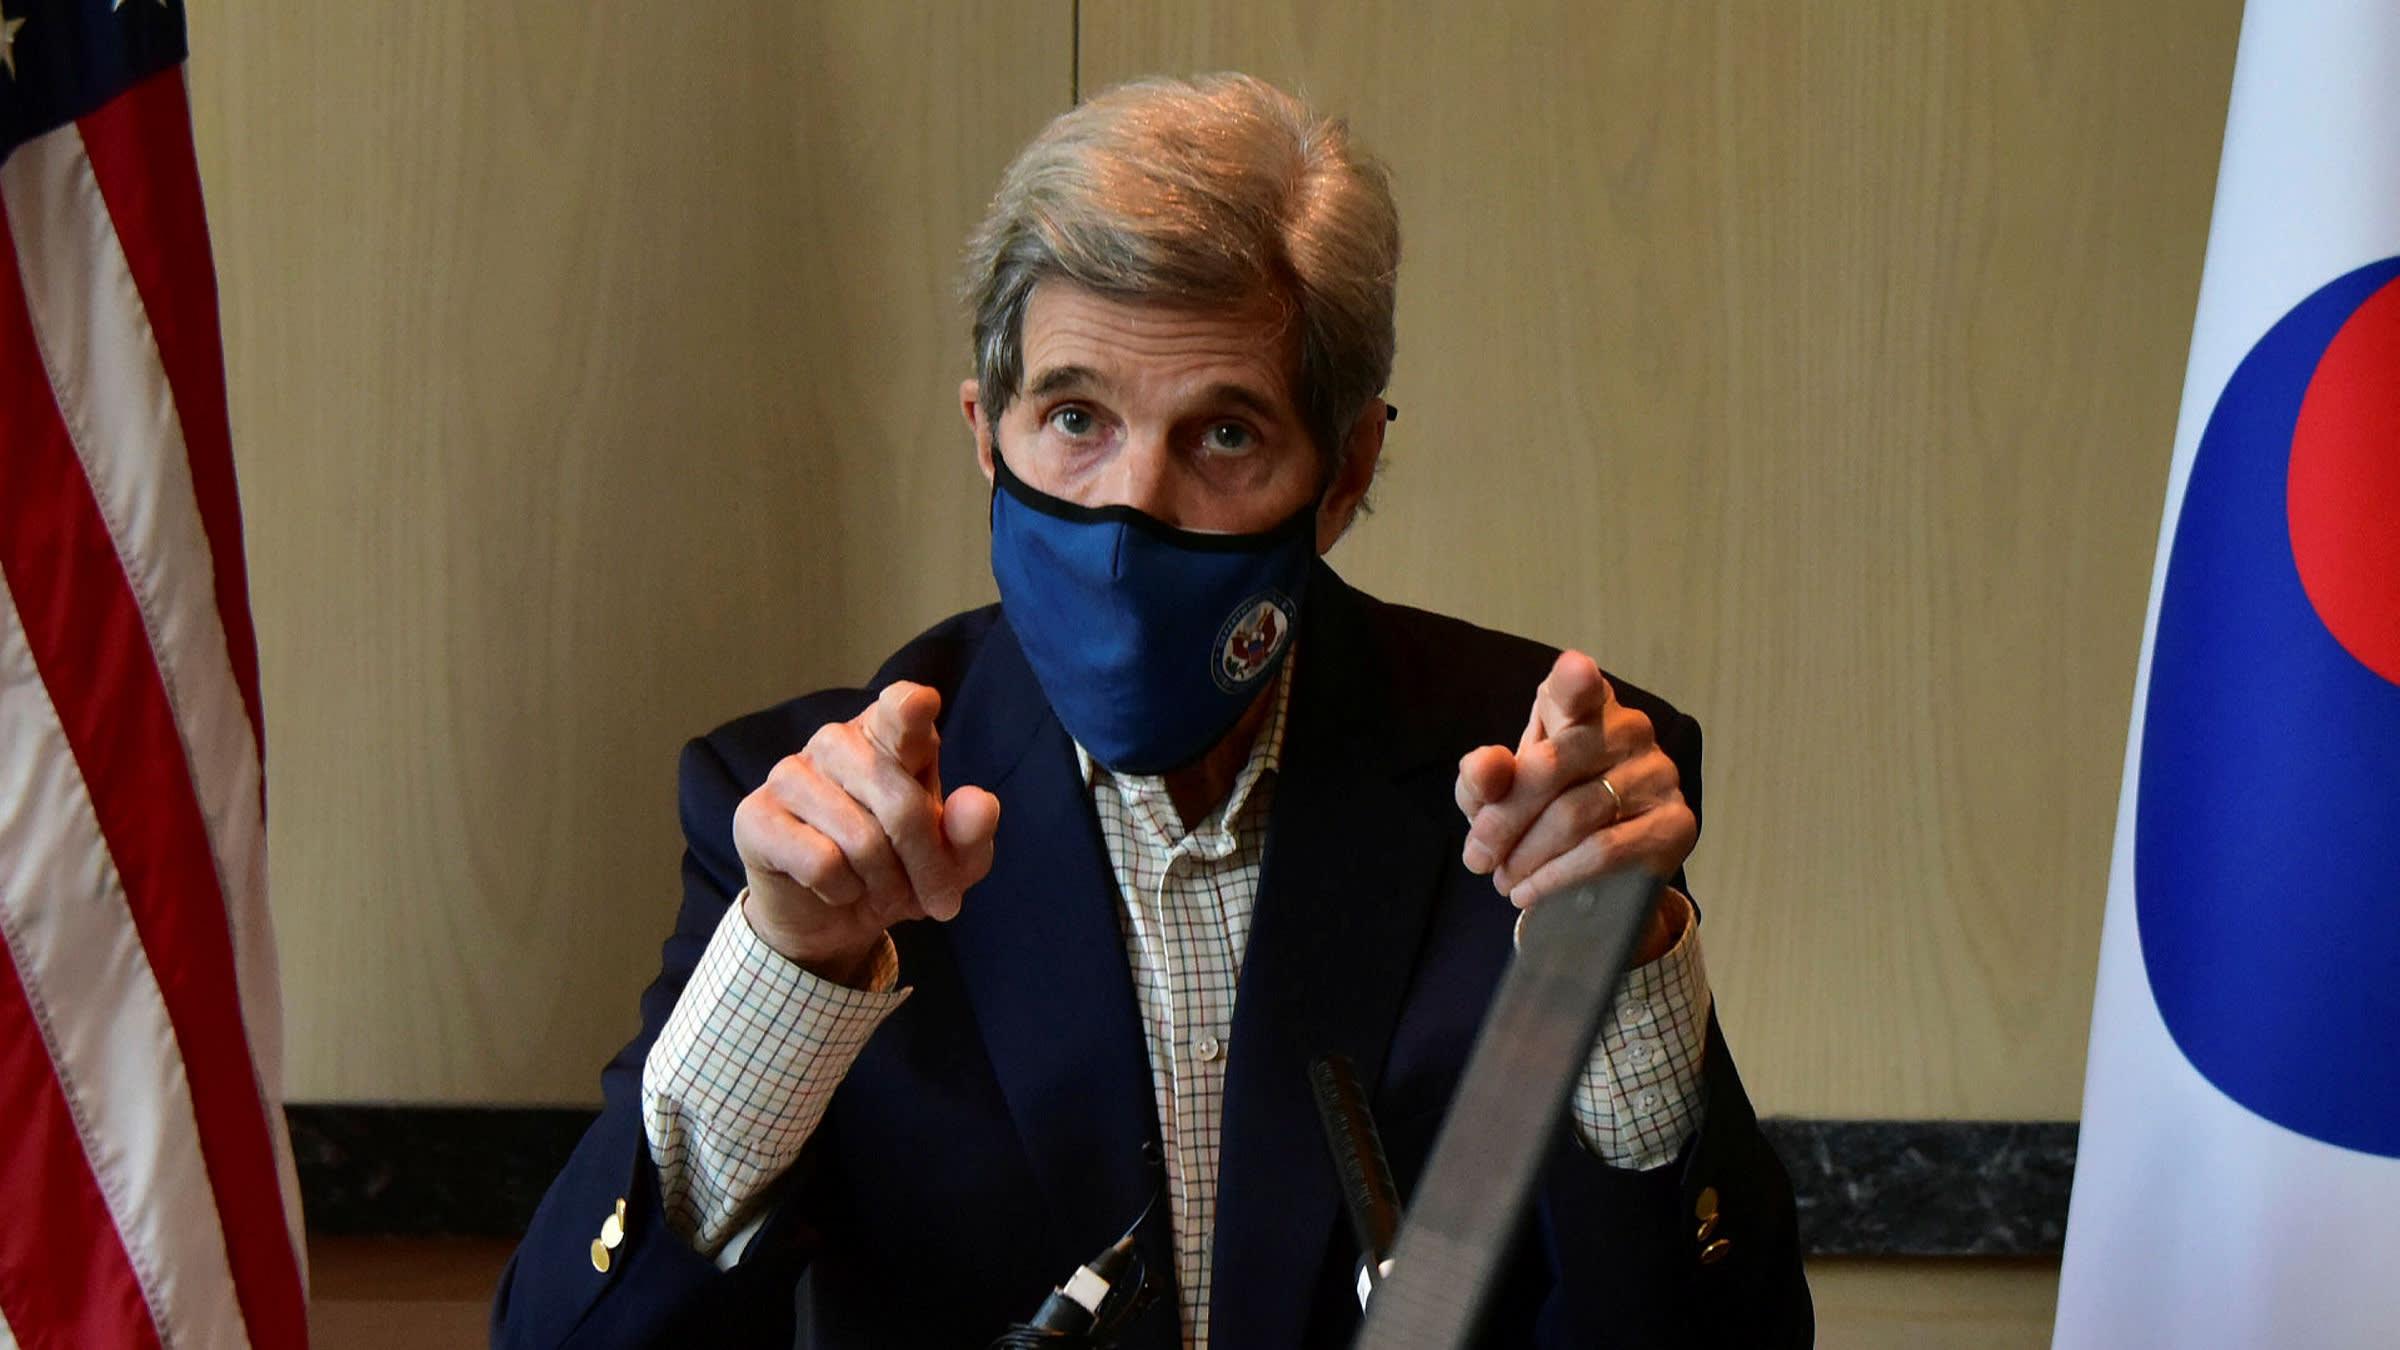 John Kerry: Banks will be held accountable for net zero pledges